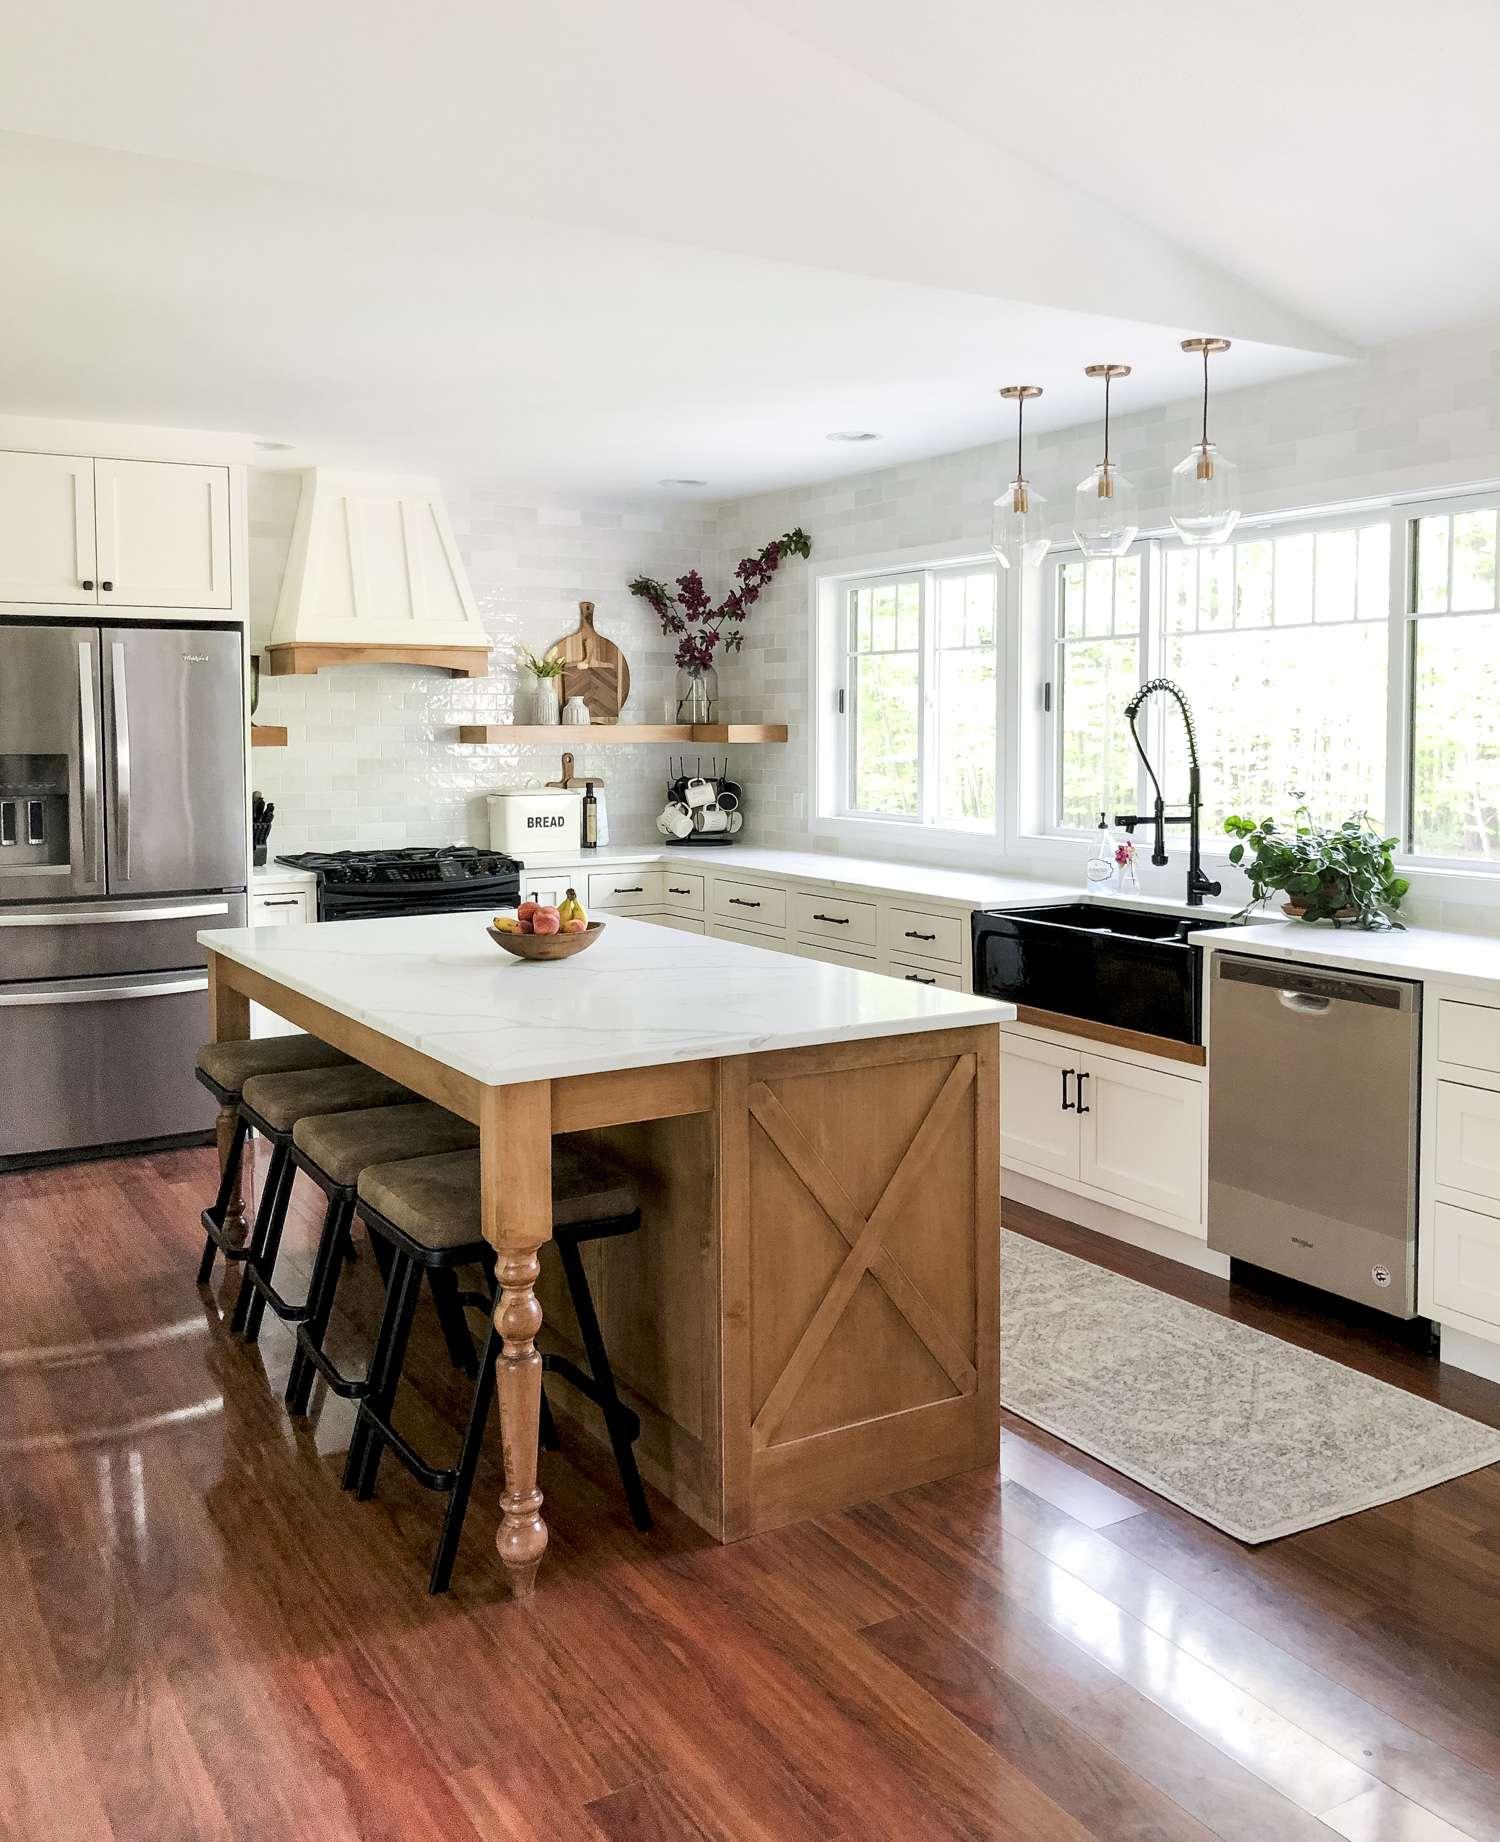 Modern farmhouse kitchen home styling.